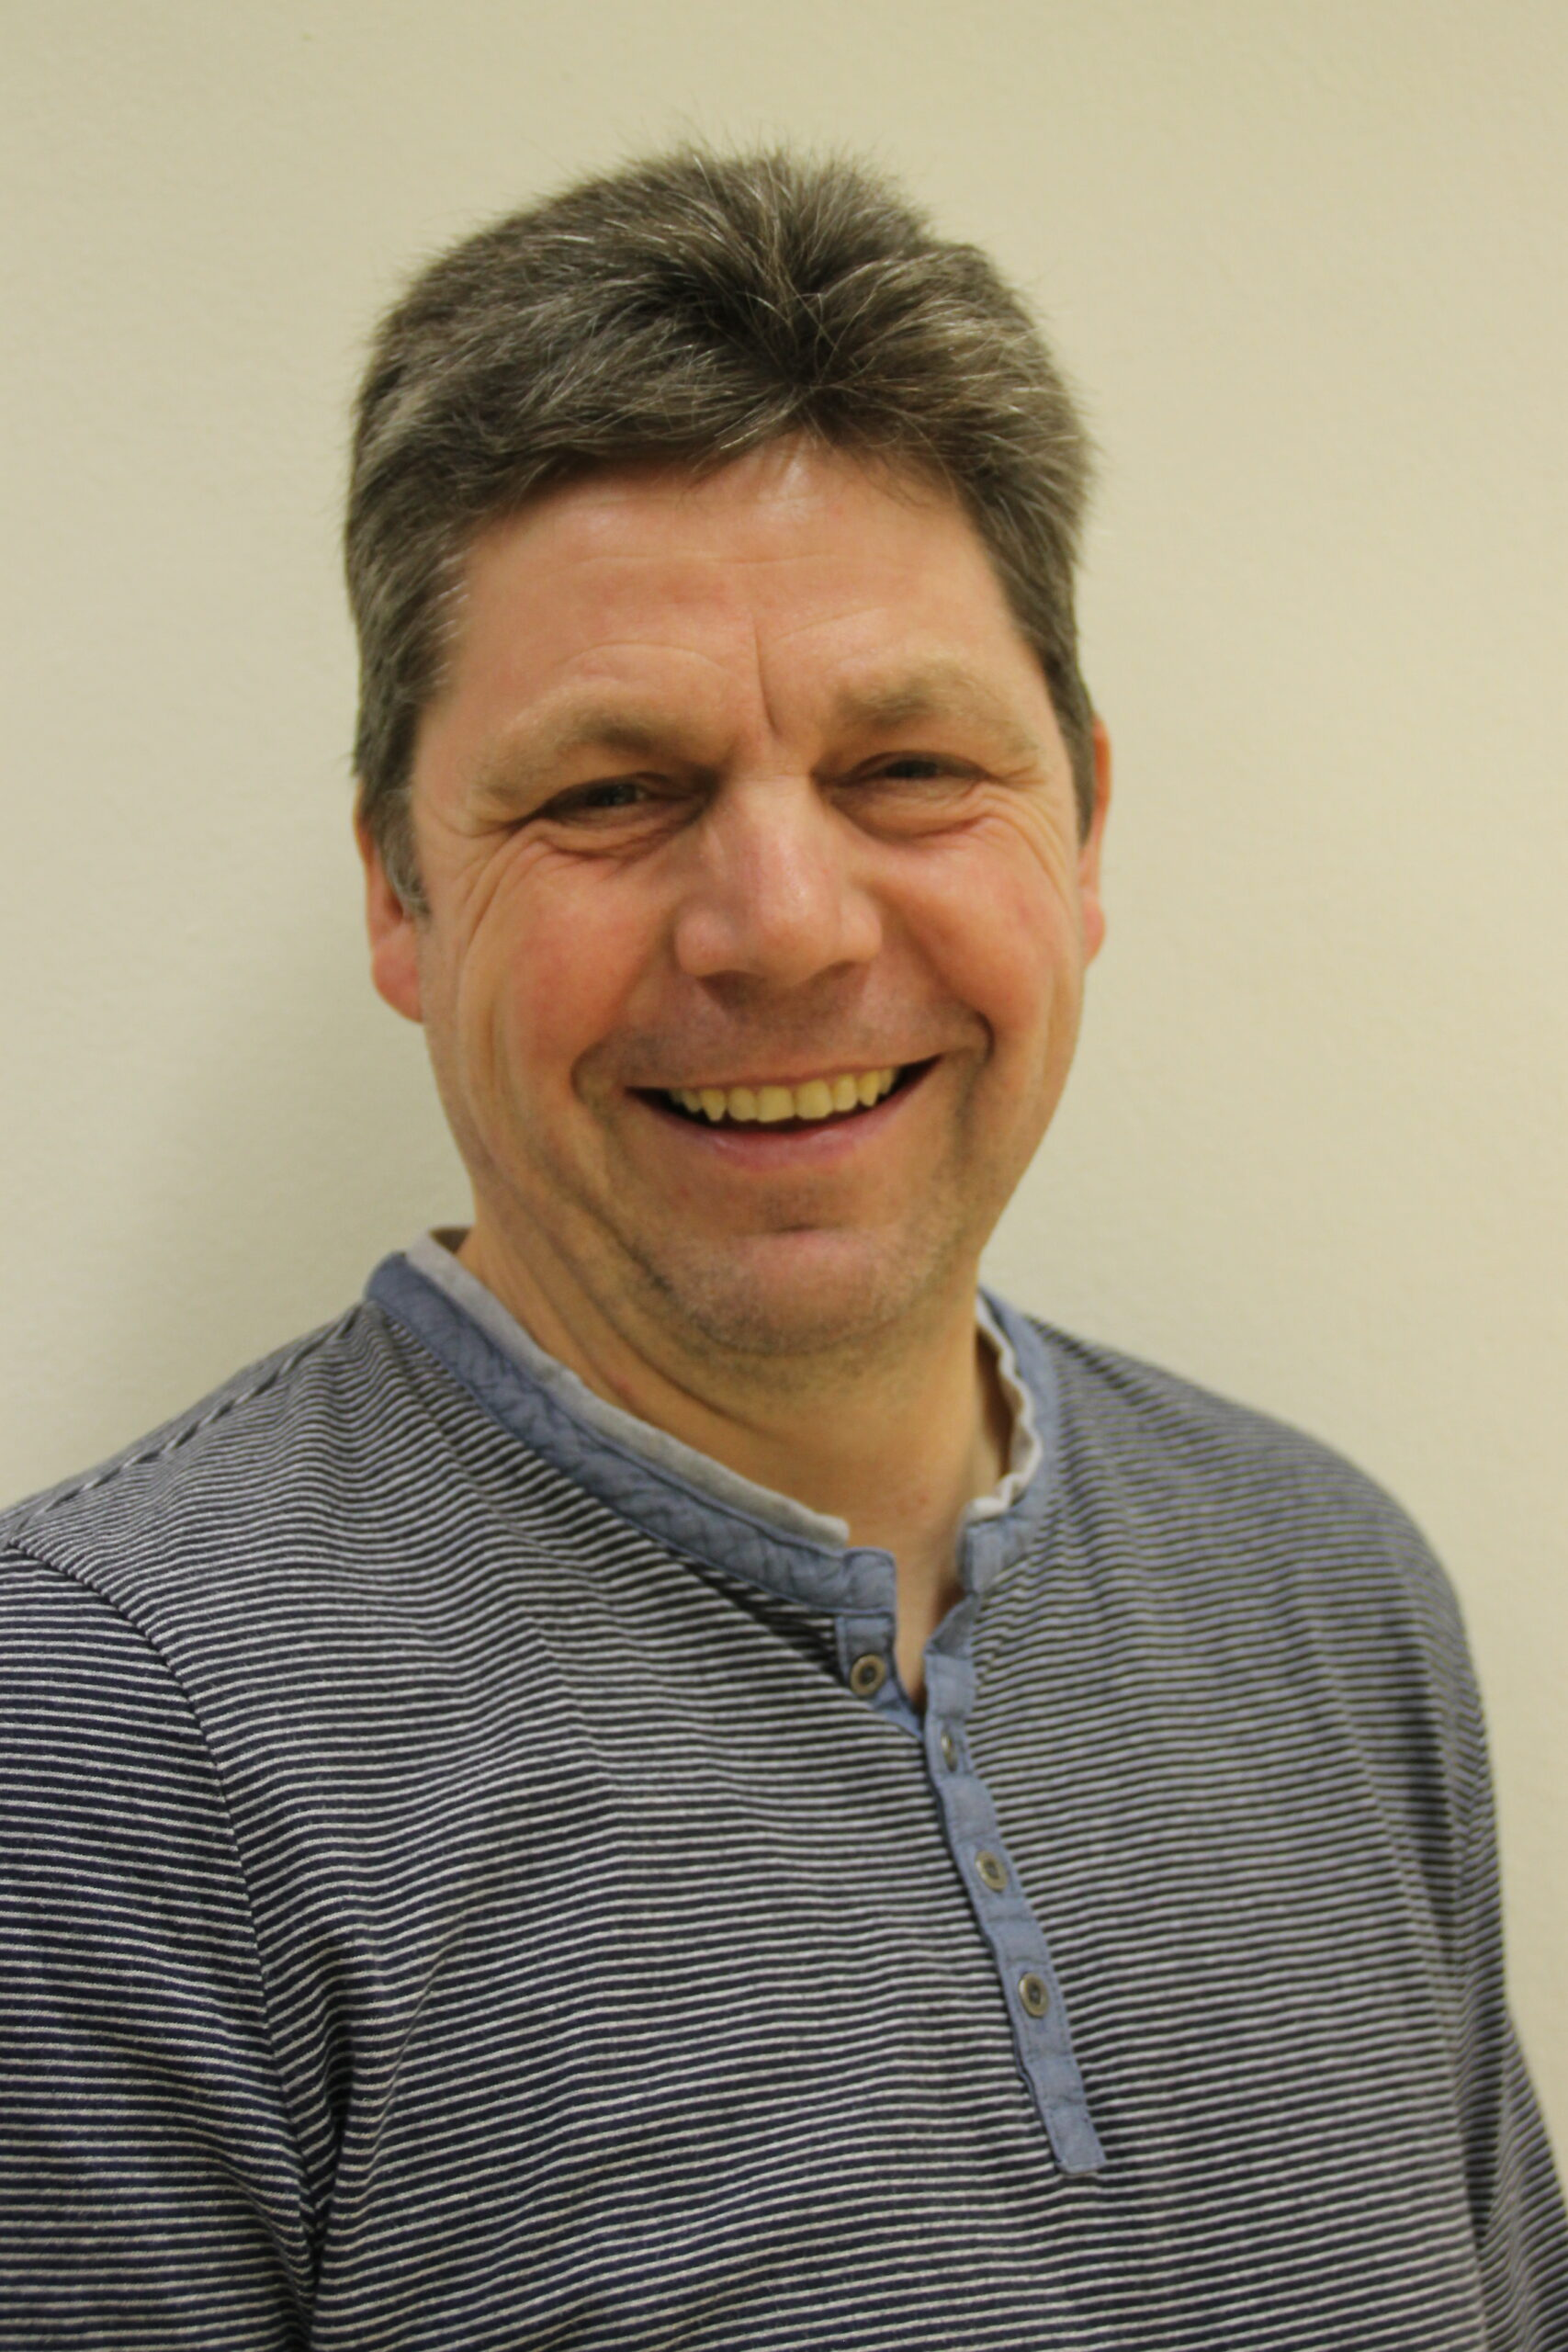 Jörg Hollstein